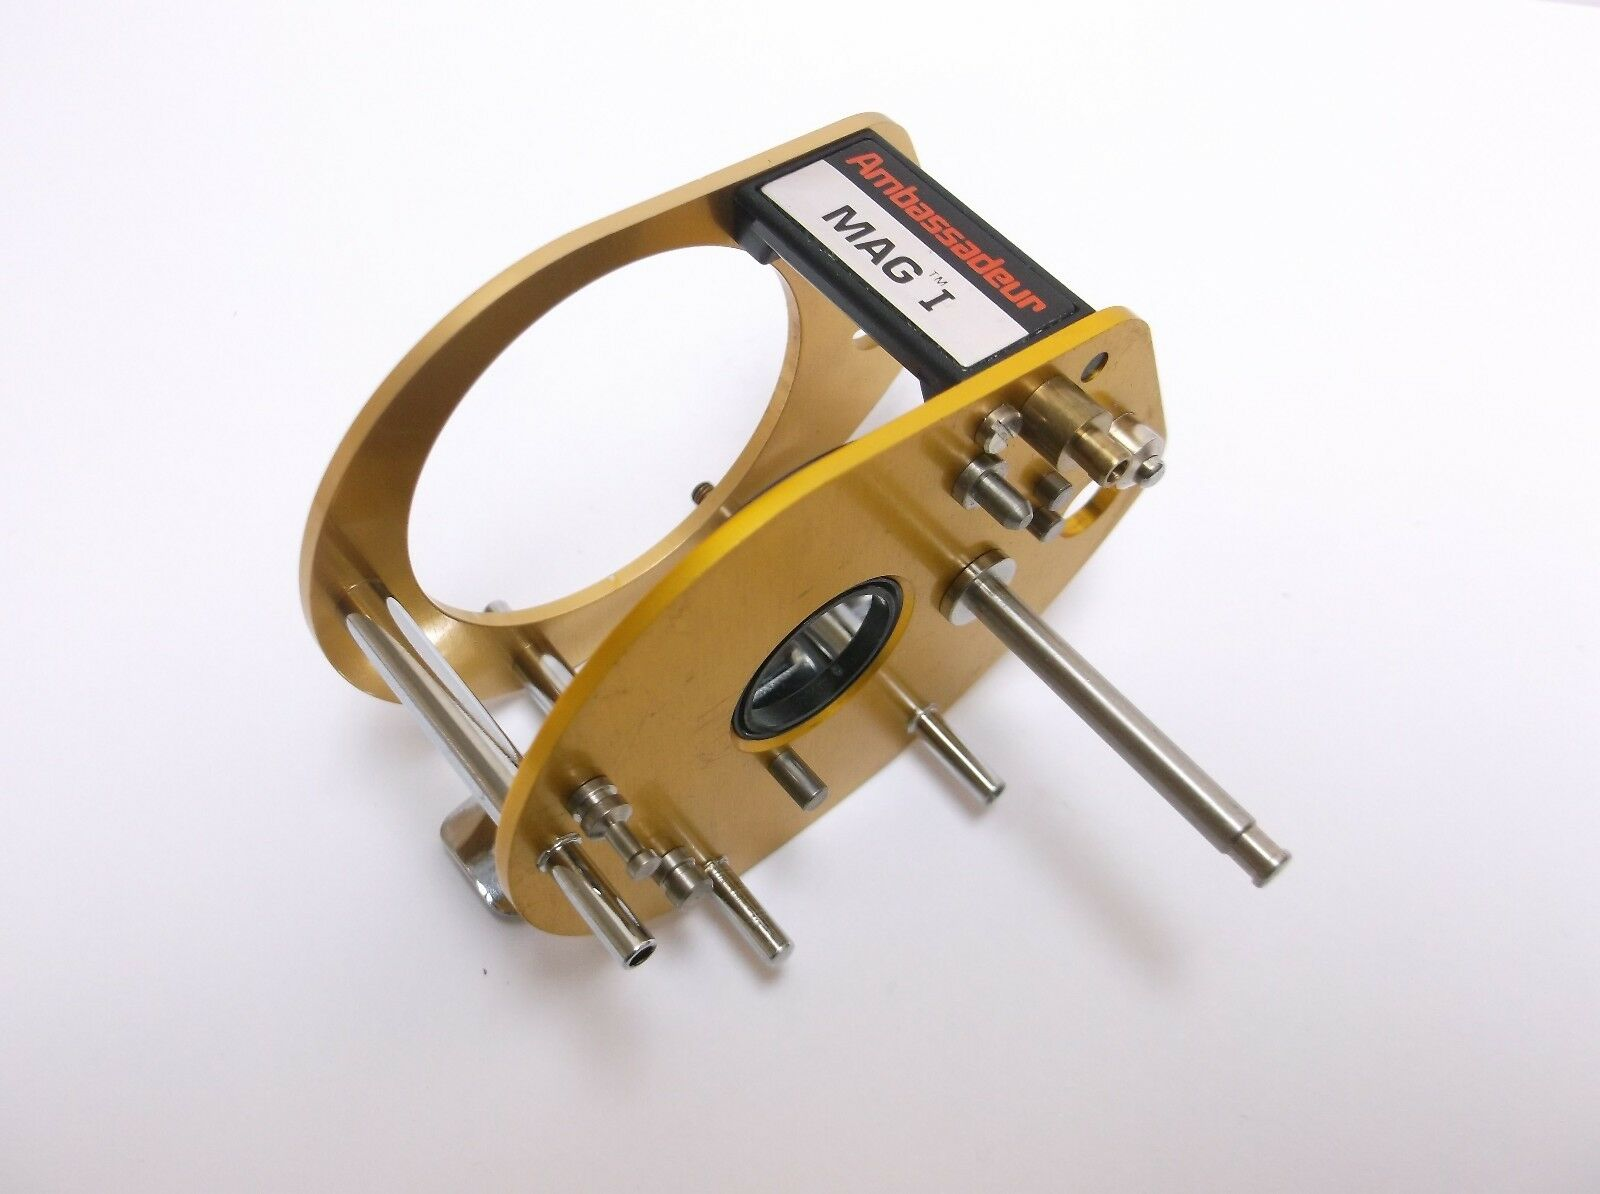 ABU GARCIA REEL PART - 975375 Ultra Mag I (82-06-00) - Frame Only  F